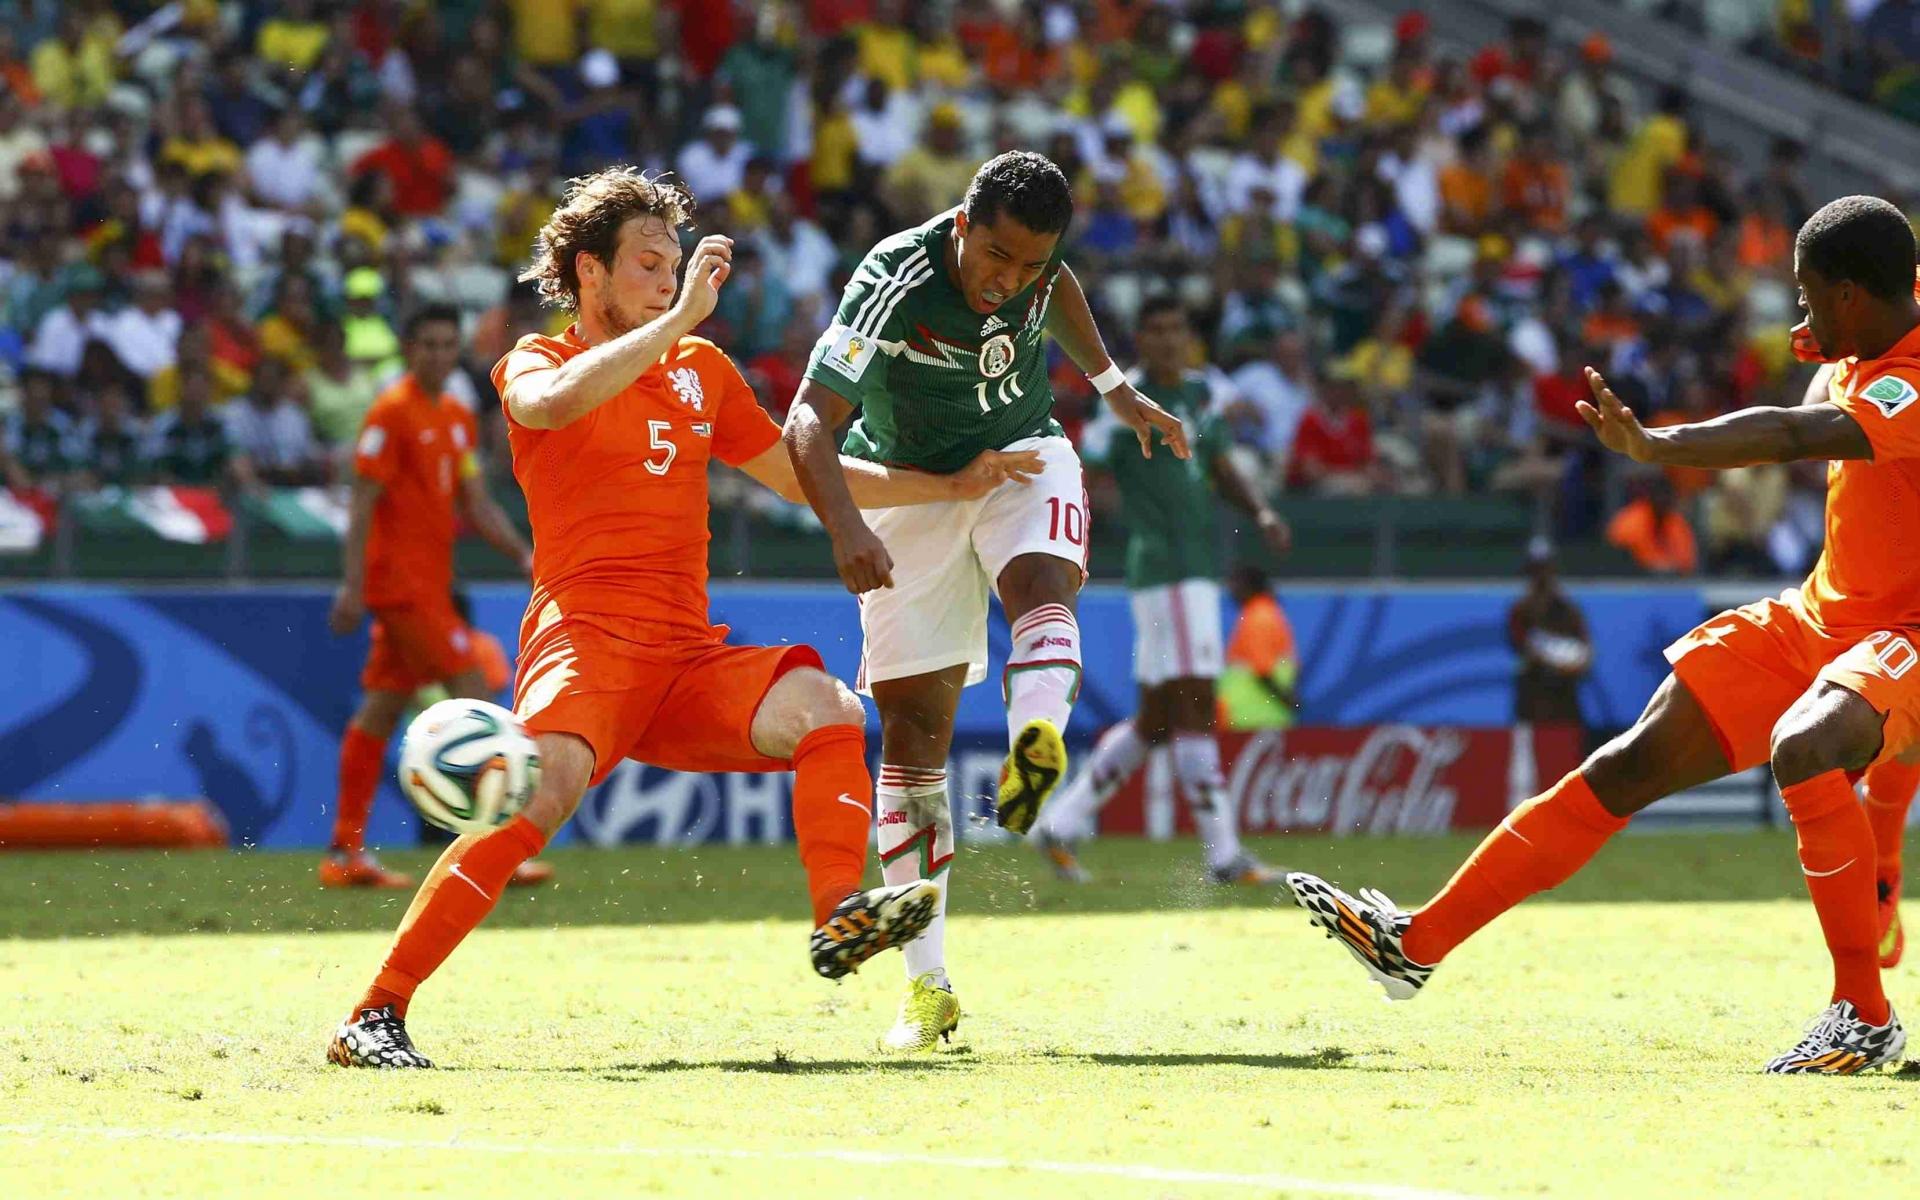 Картинки Аргентина, против, нидерланды, чемпионат мира по футболу 2014 года, футбол фото и обои на рабочий стол